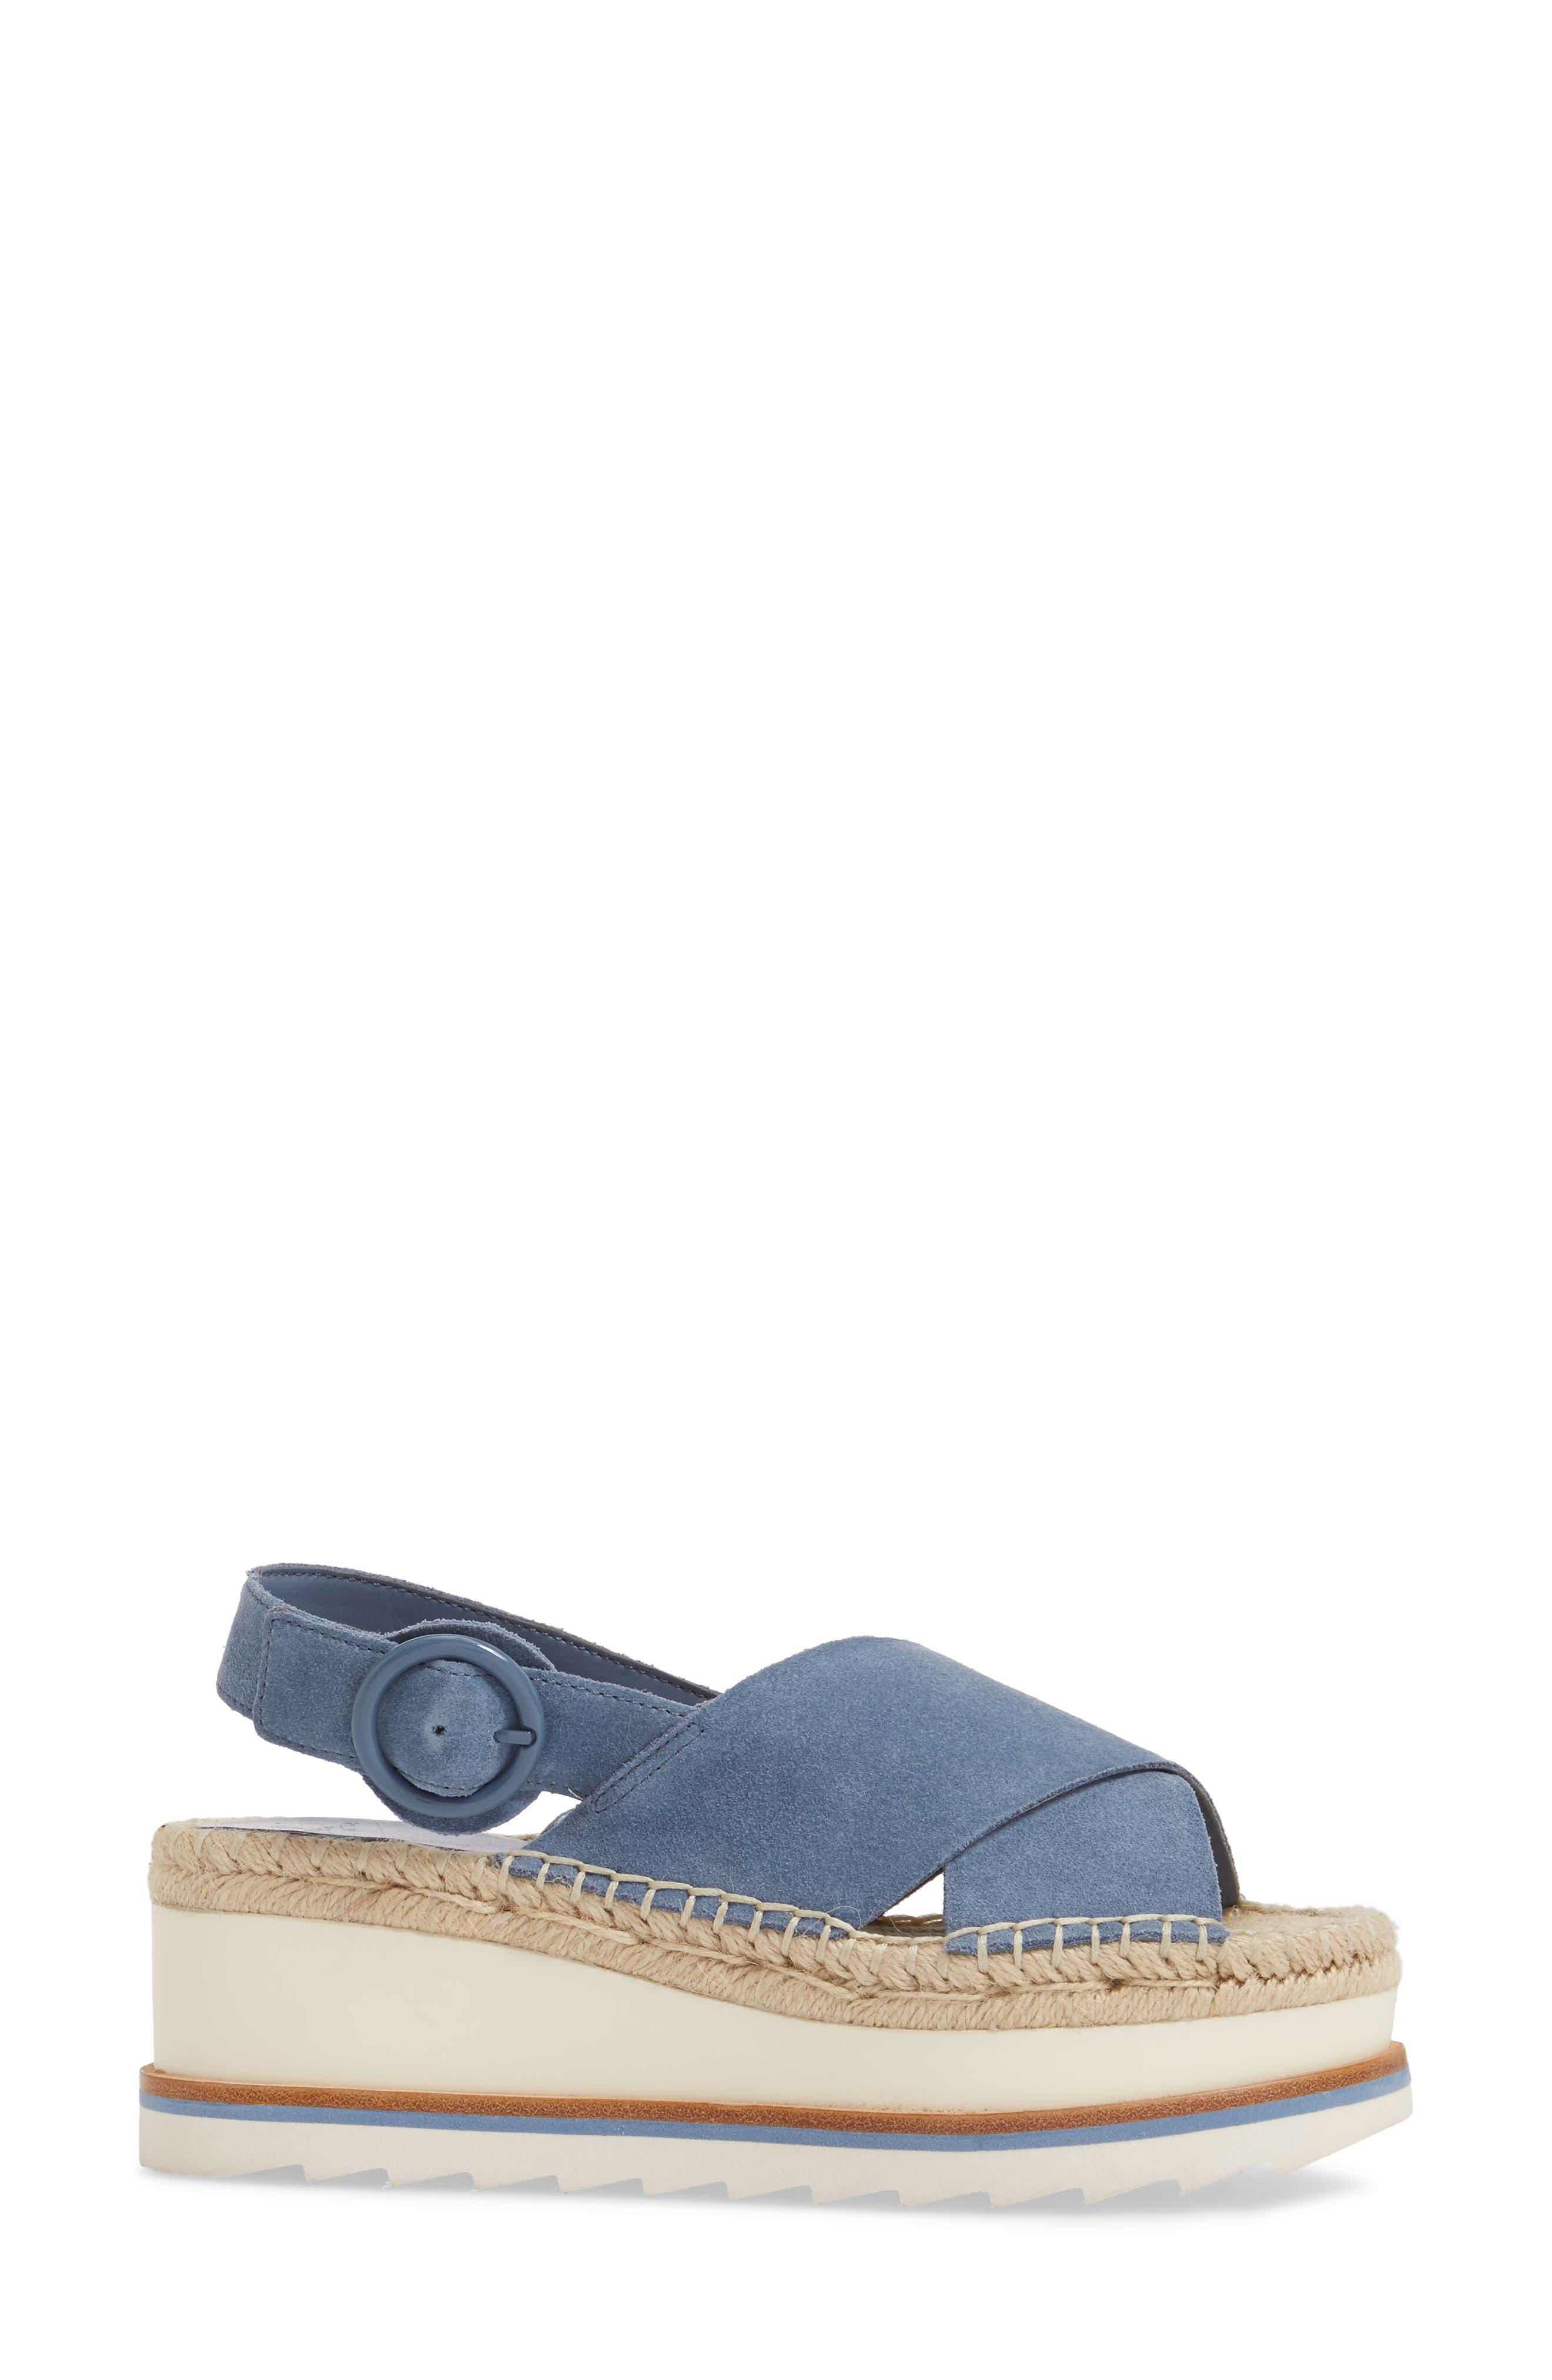 Glenna Platform Slingback Sandal,                             Alternate thumbnail 11, color,